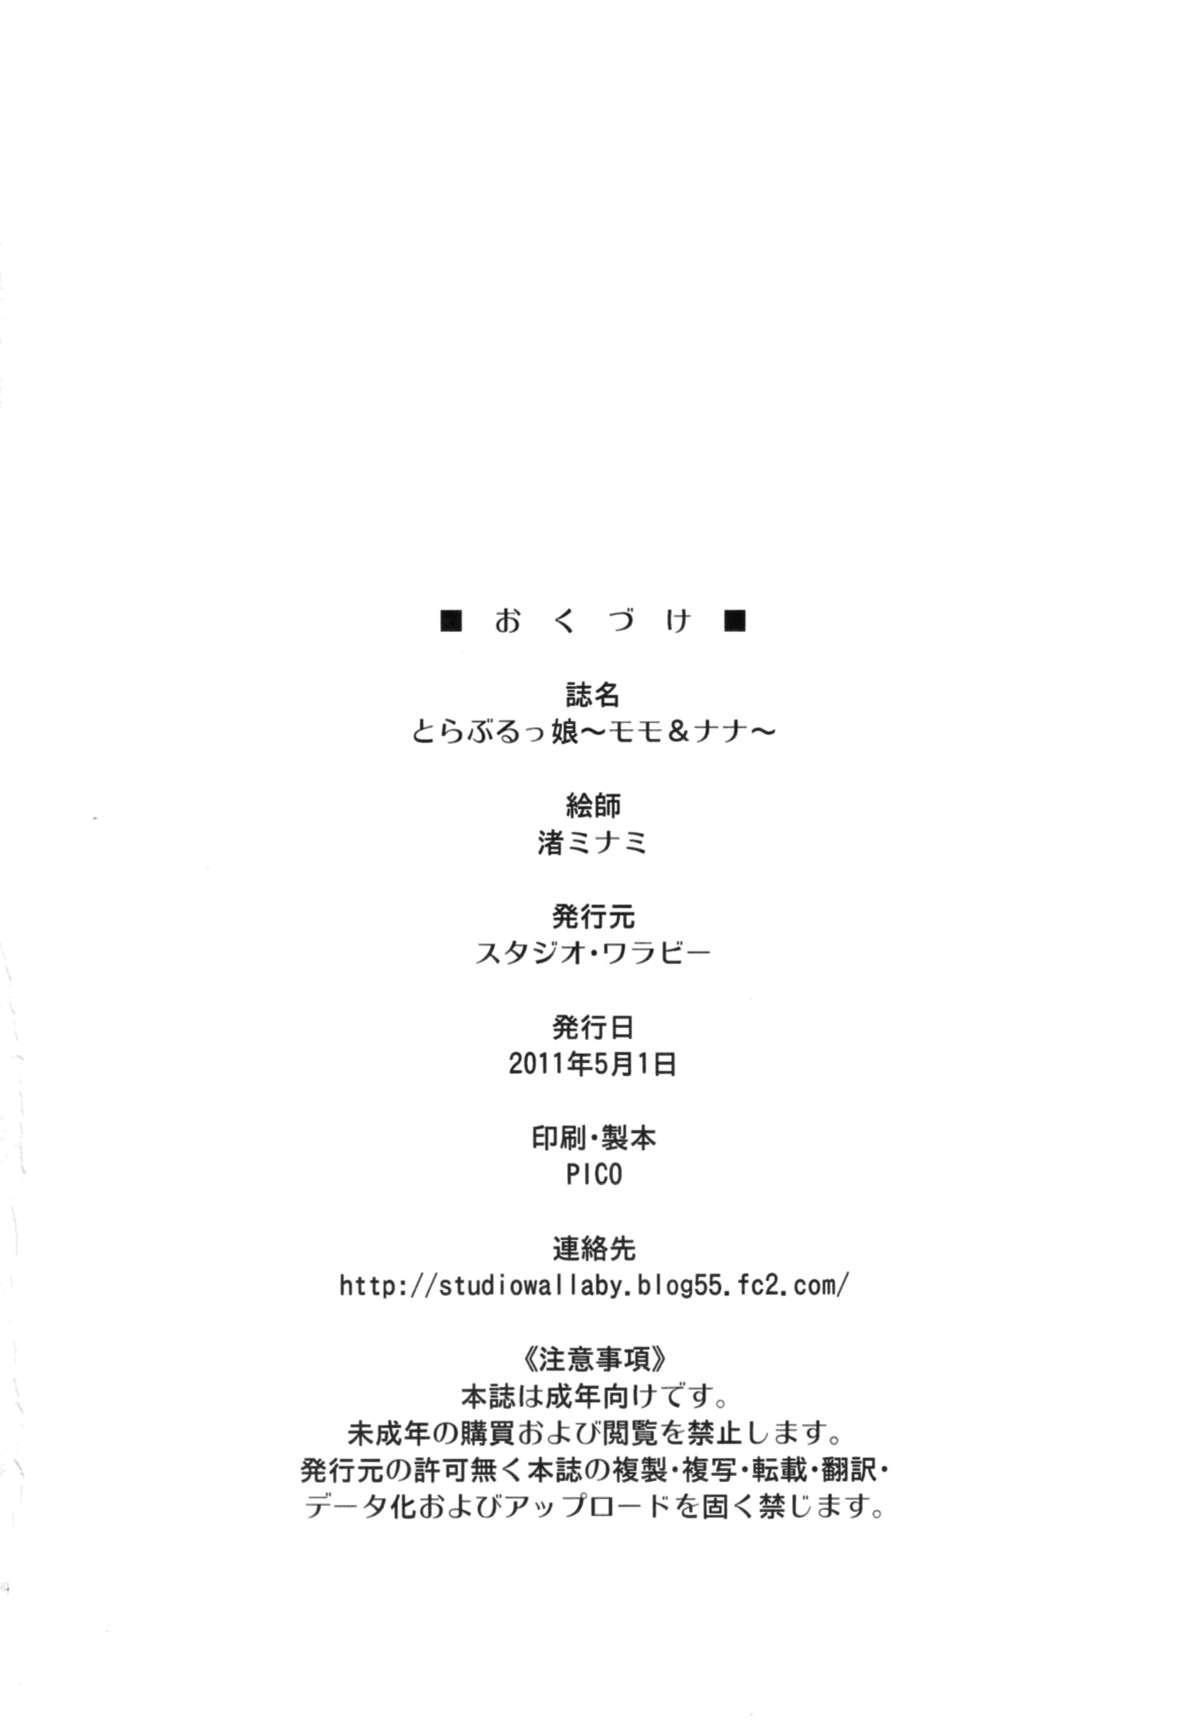 (COMIC1☆5) [Studio Wallaby (Nagisa Minami)] Troublekko ~Momo & Nana~   To LOVE-Ru Girls ~Momo & Nana~ (To LOVE-Ru) [English] =TV + Afro= 31